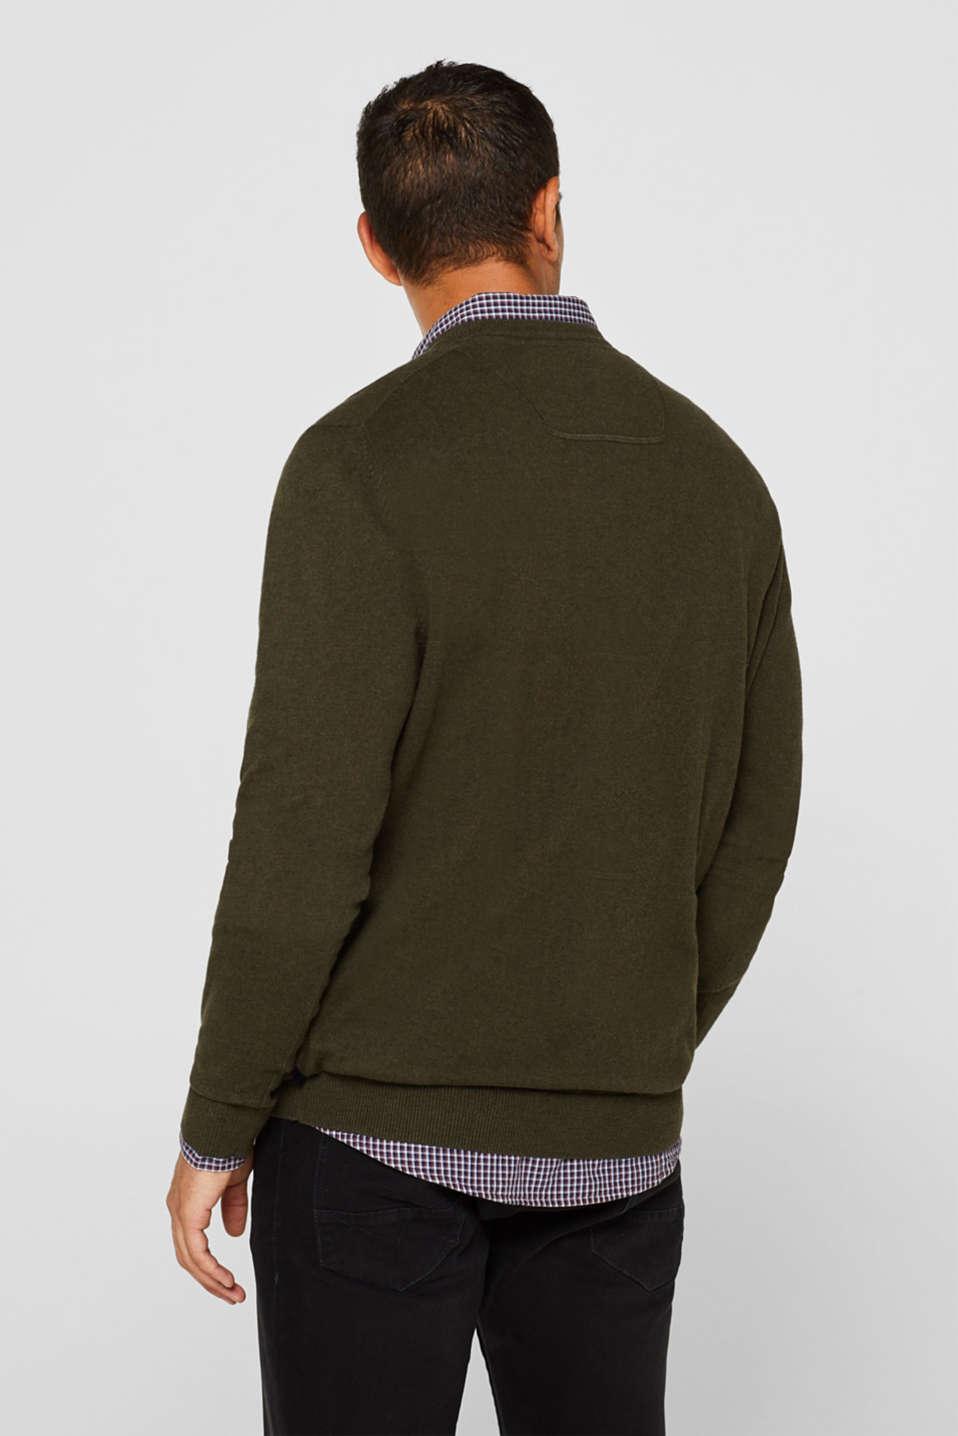 With cashmere: Basic style jumper, DARK KHAKI, detail image number 3